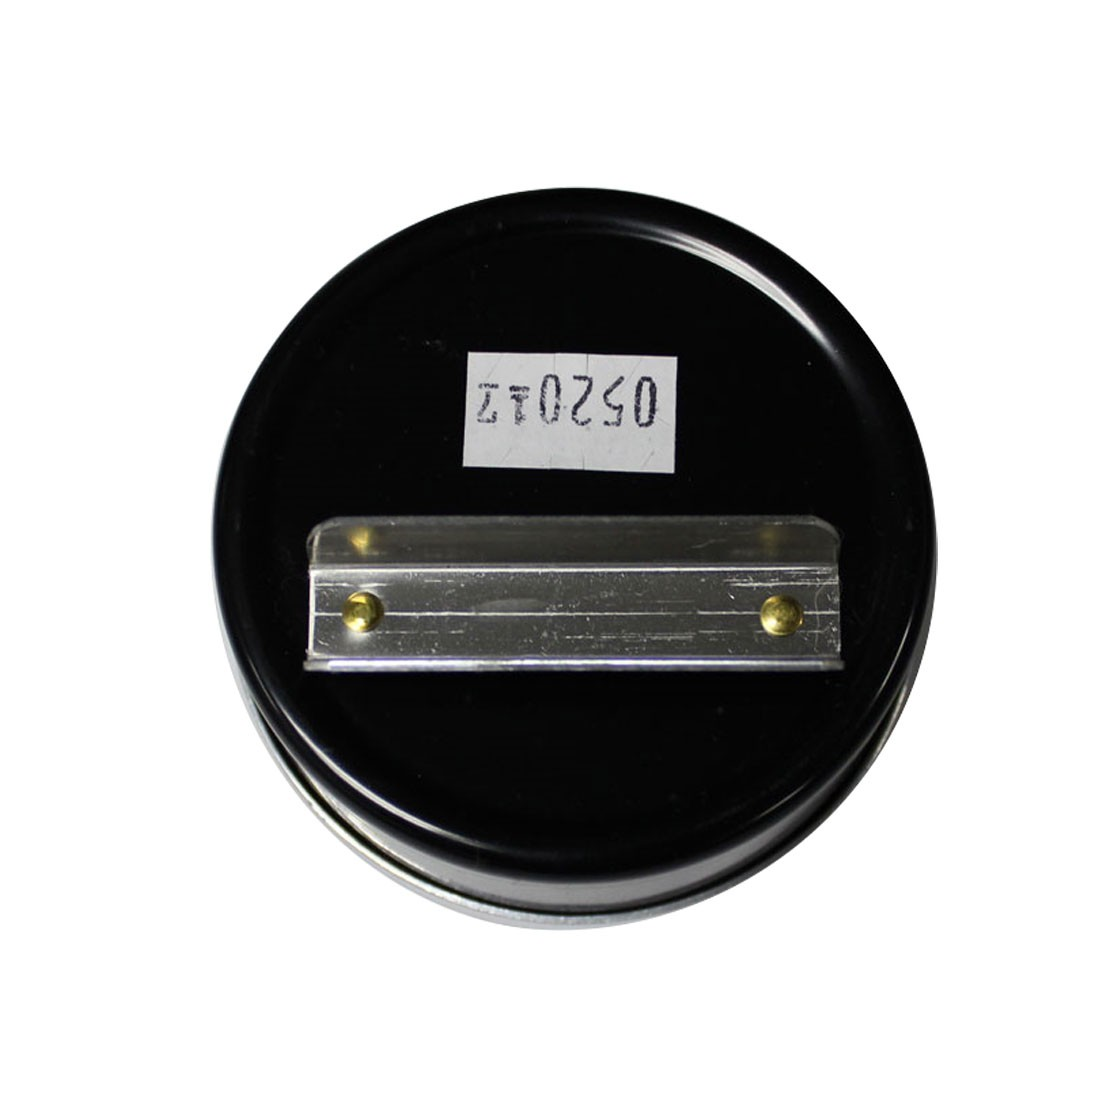 Hoyt 600 Amp Analog Inductive Starter Current Indicator - Front View